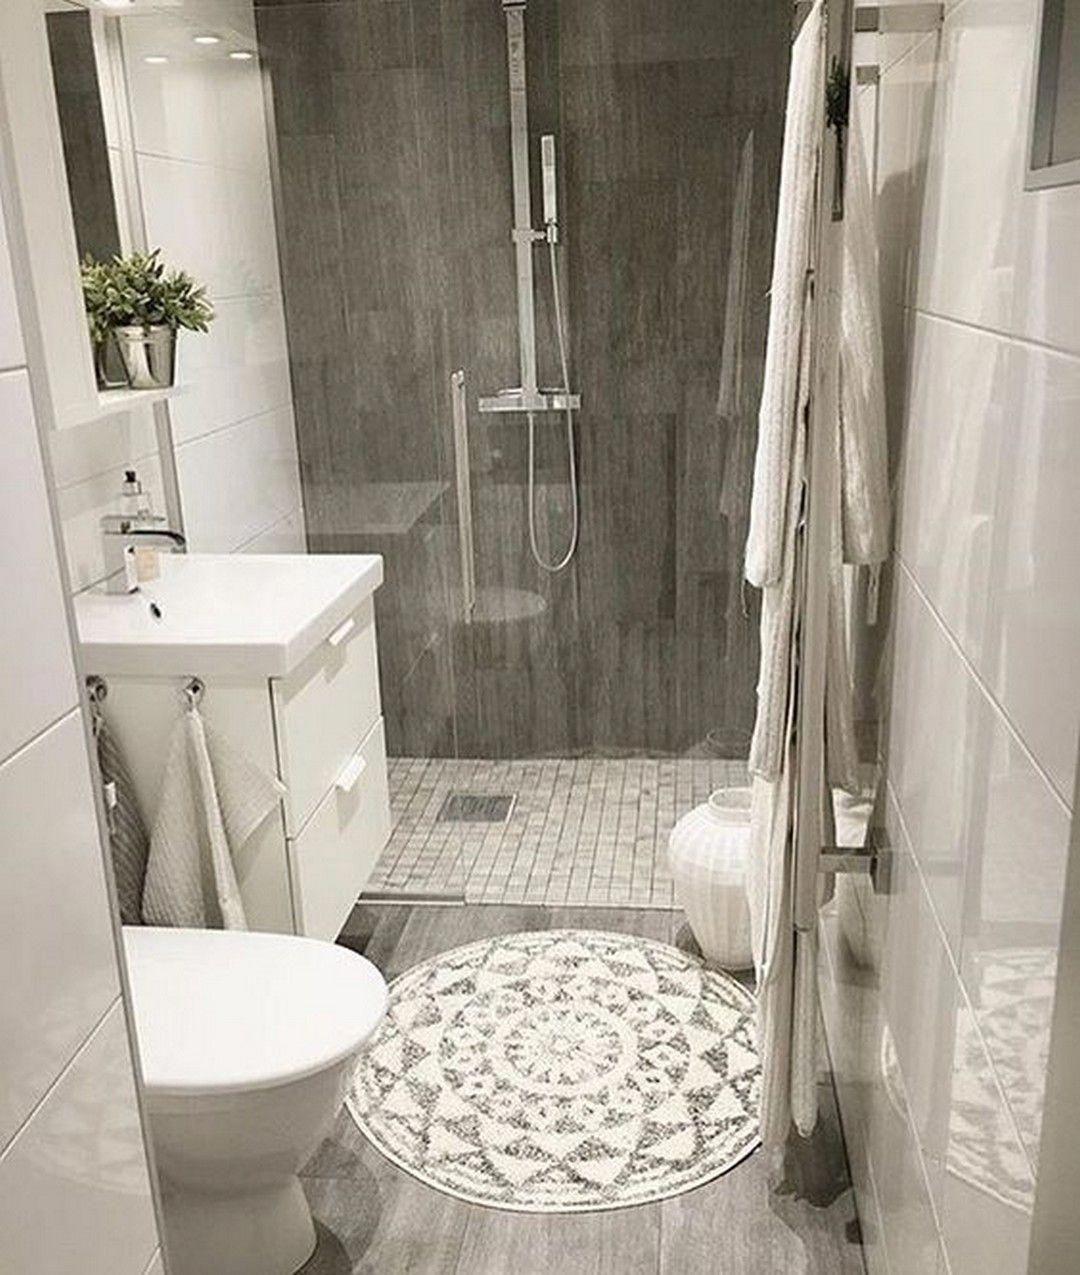 Dessin Salle De Bain bathroomrenovations | décoration petite salle de bain